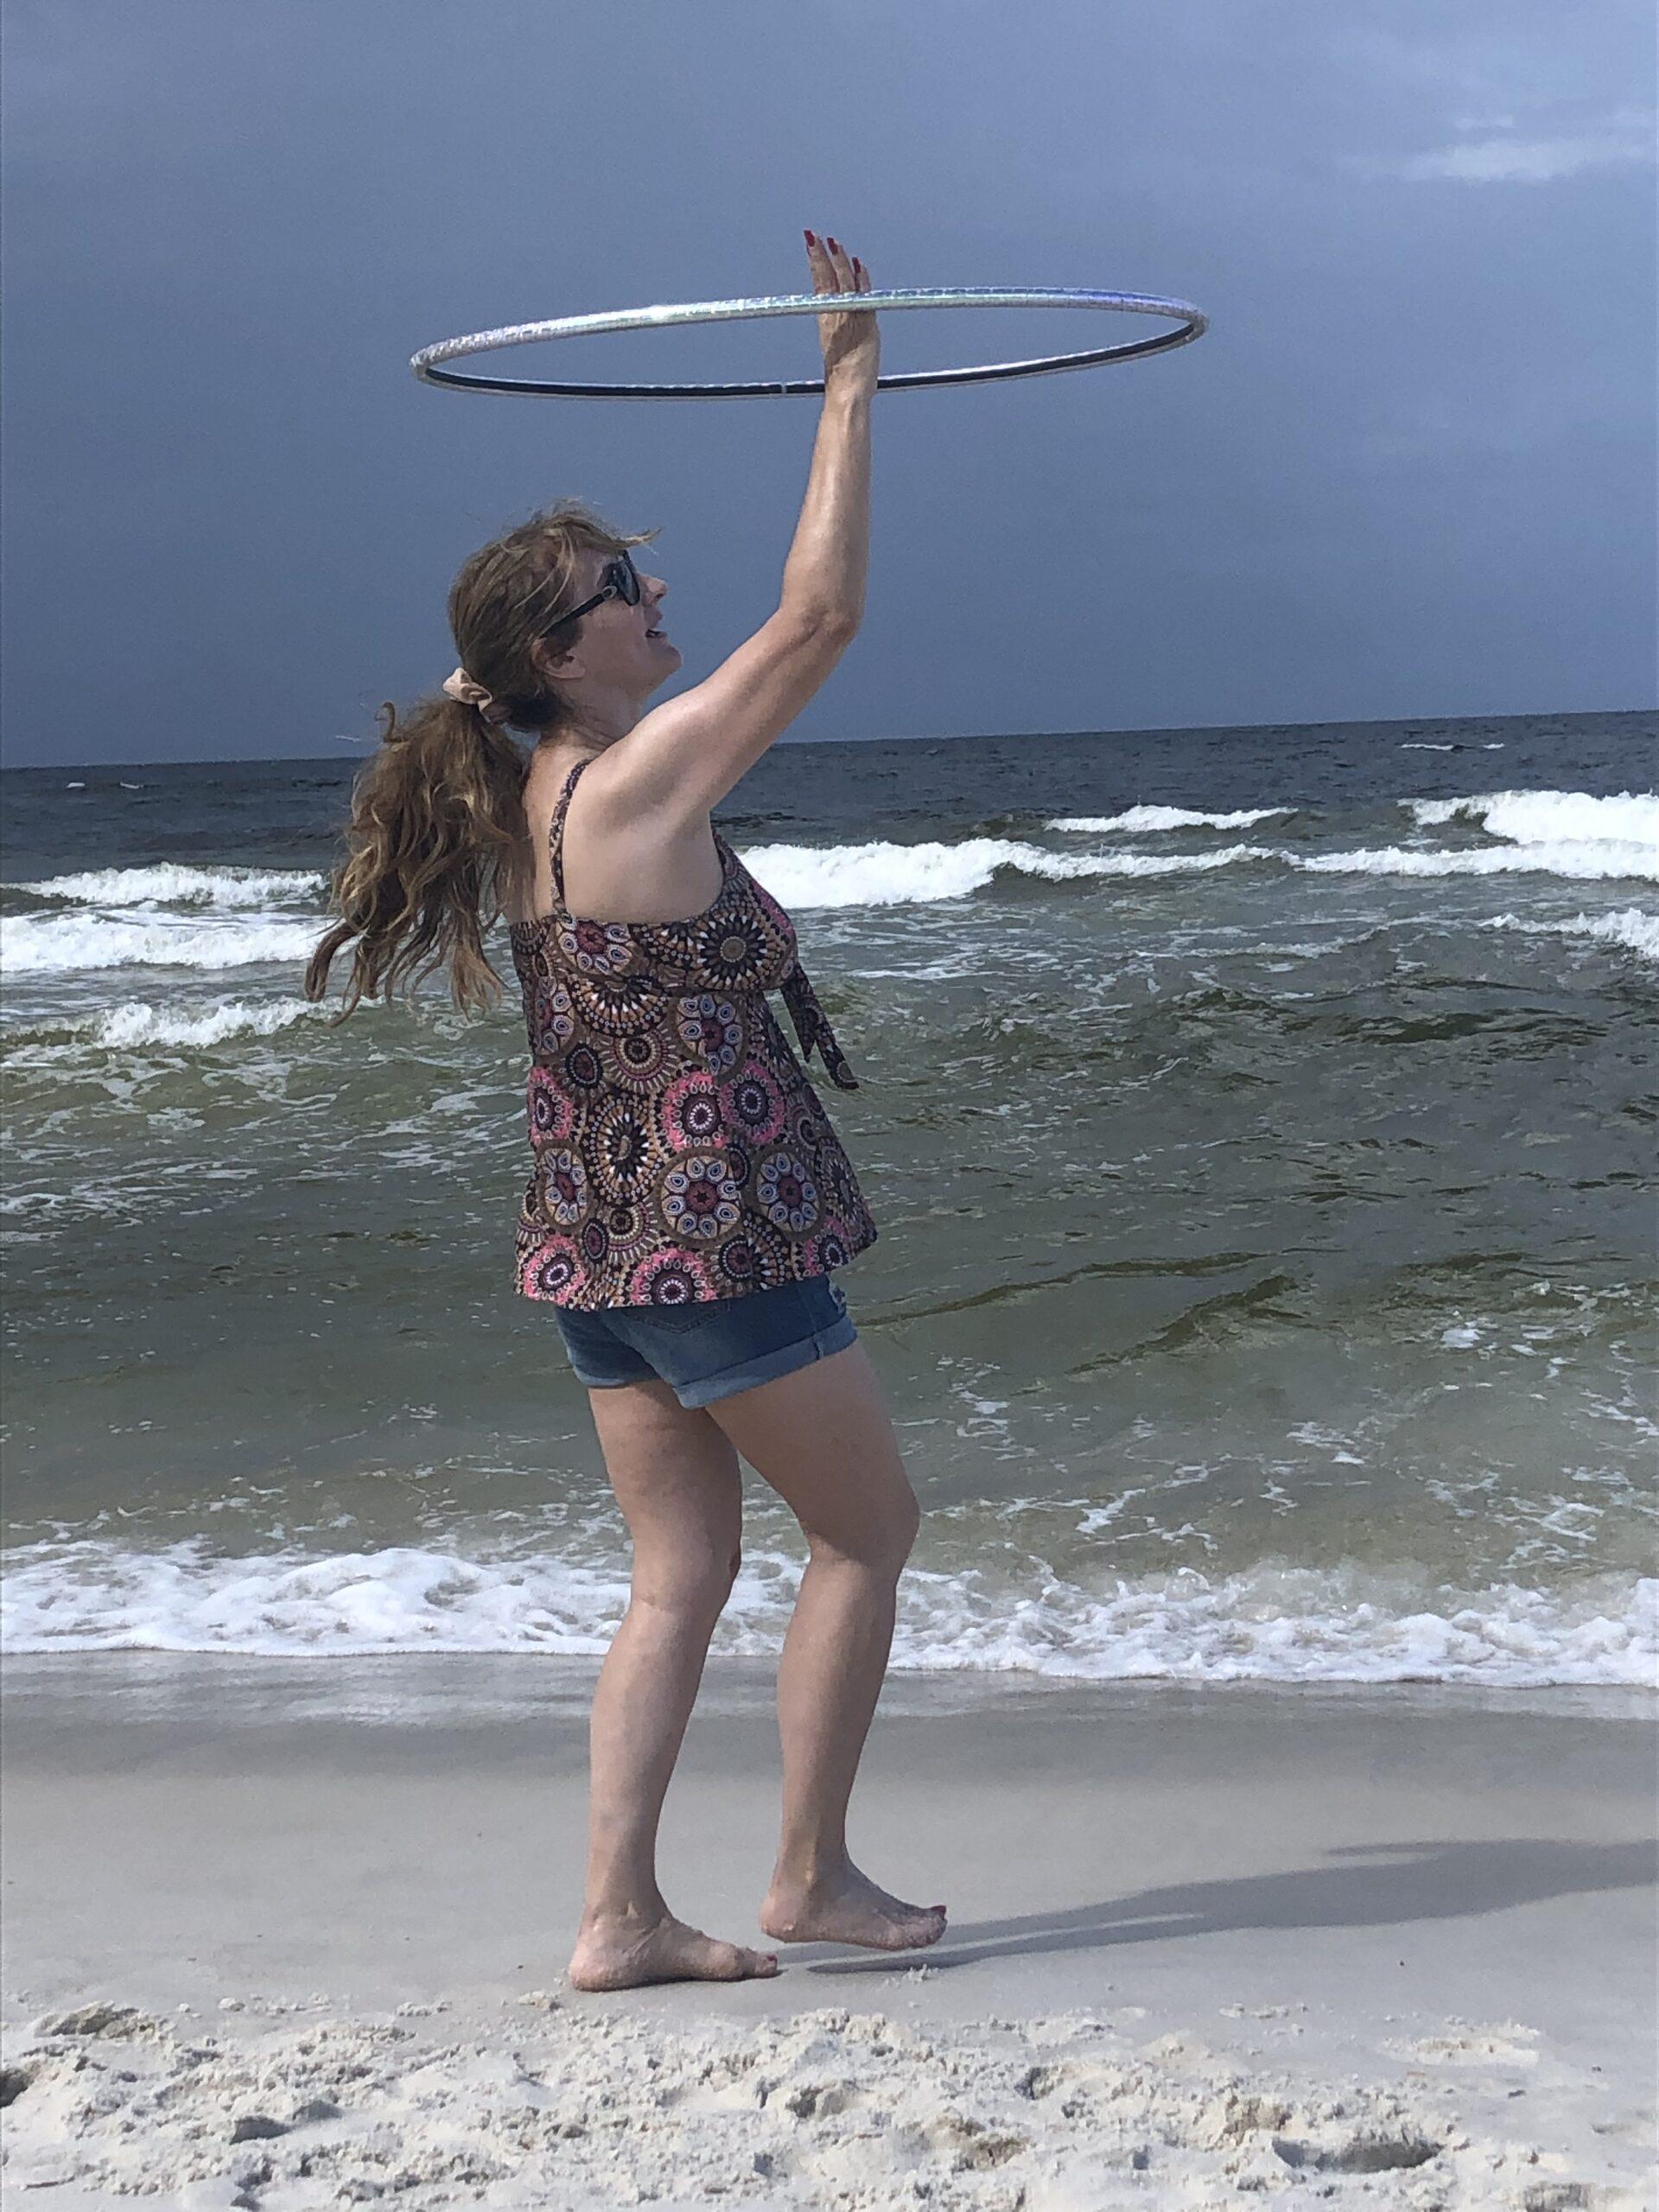 Woman spinning hula hoop on sandy beach